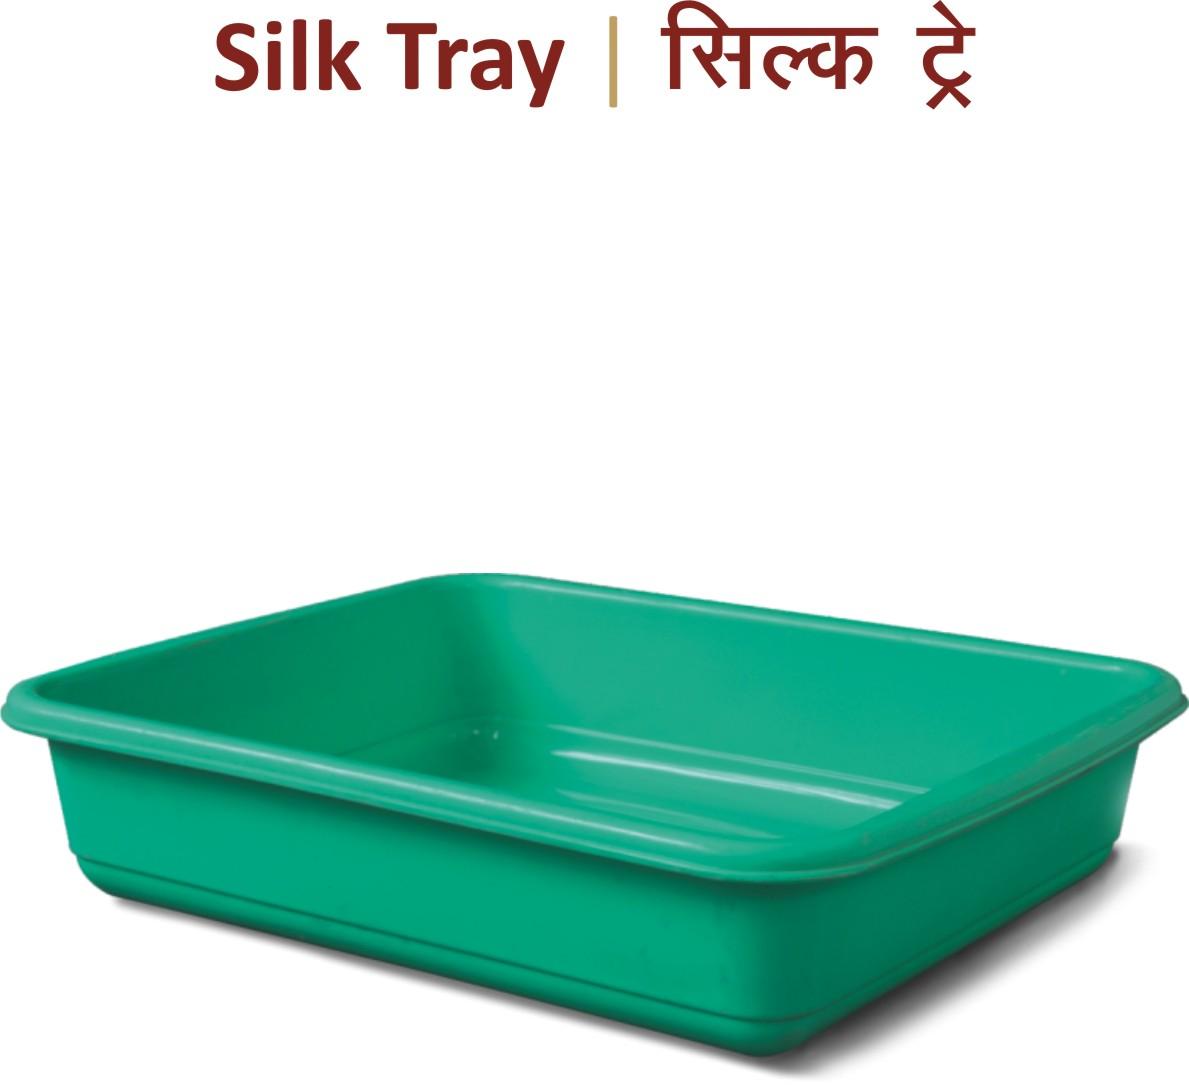 Silk Tray